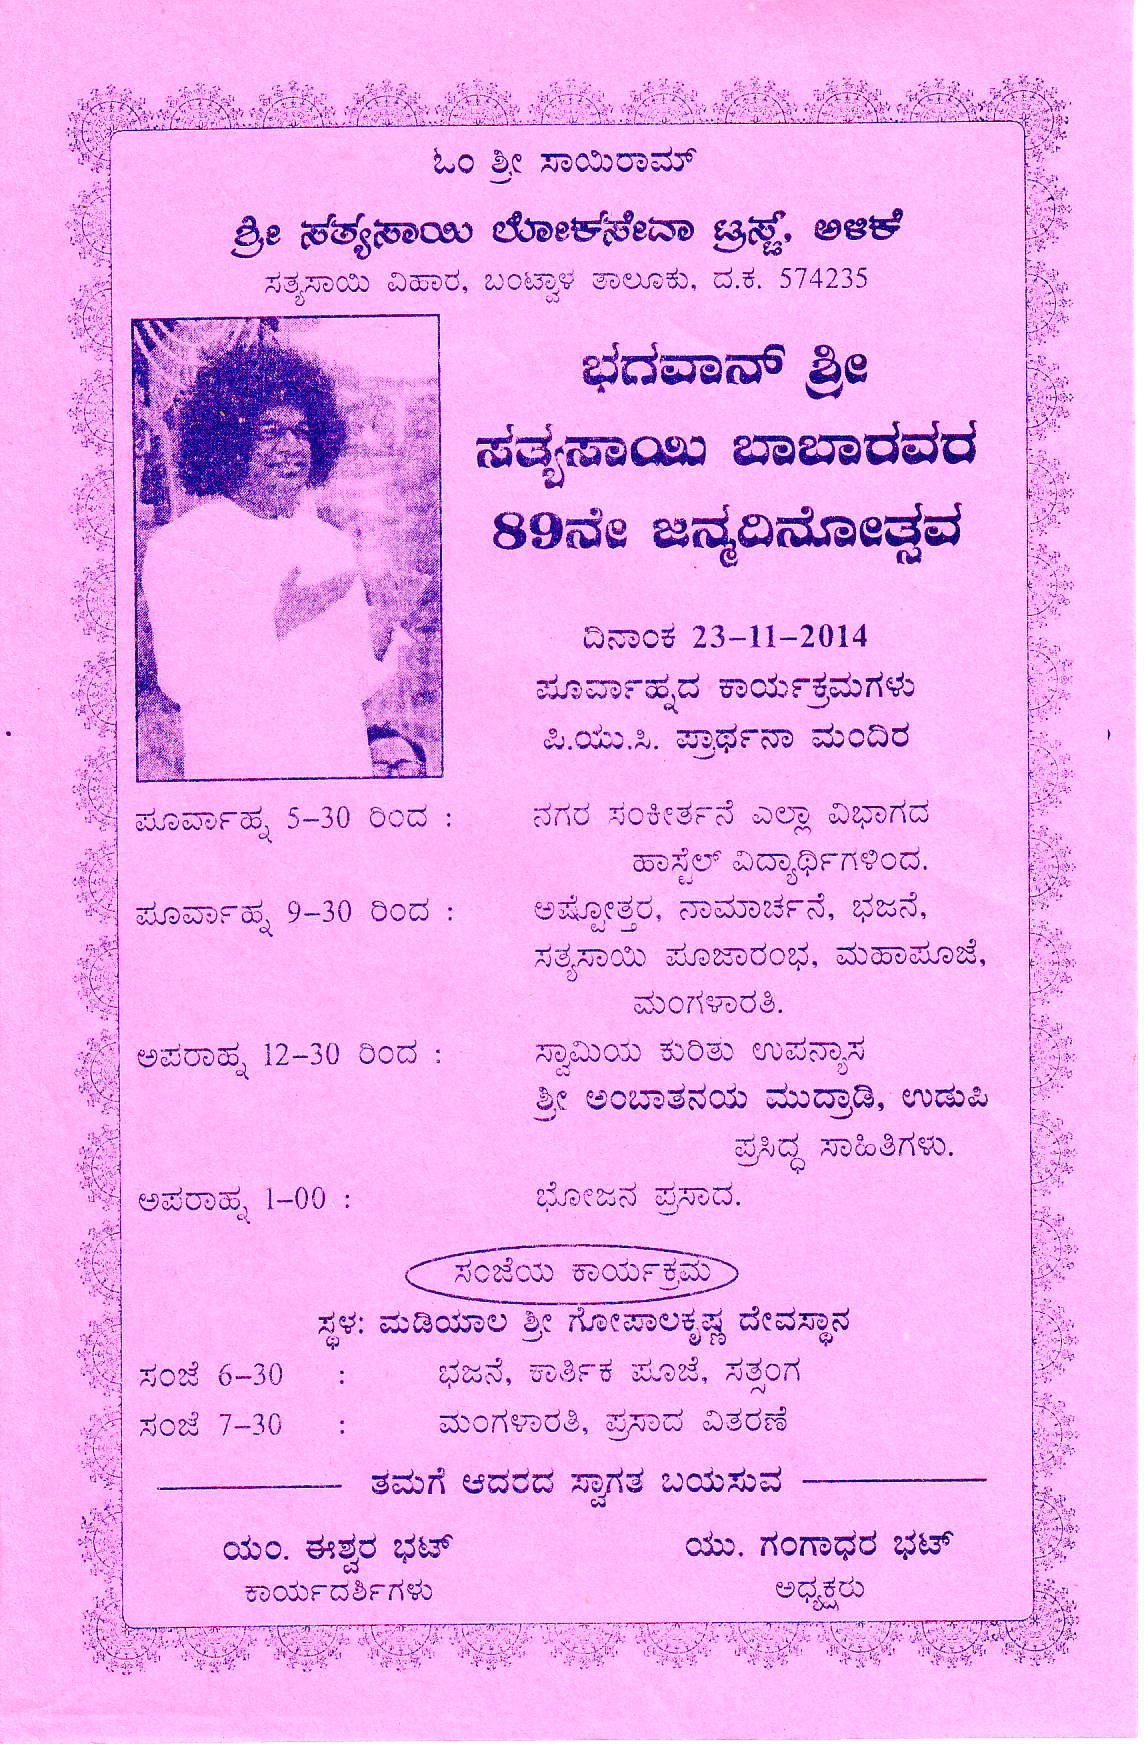 89th Birthday Invitation